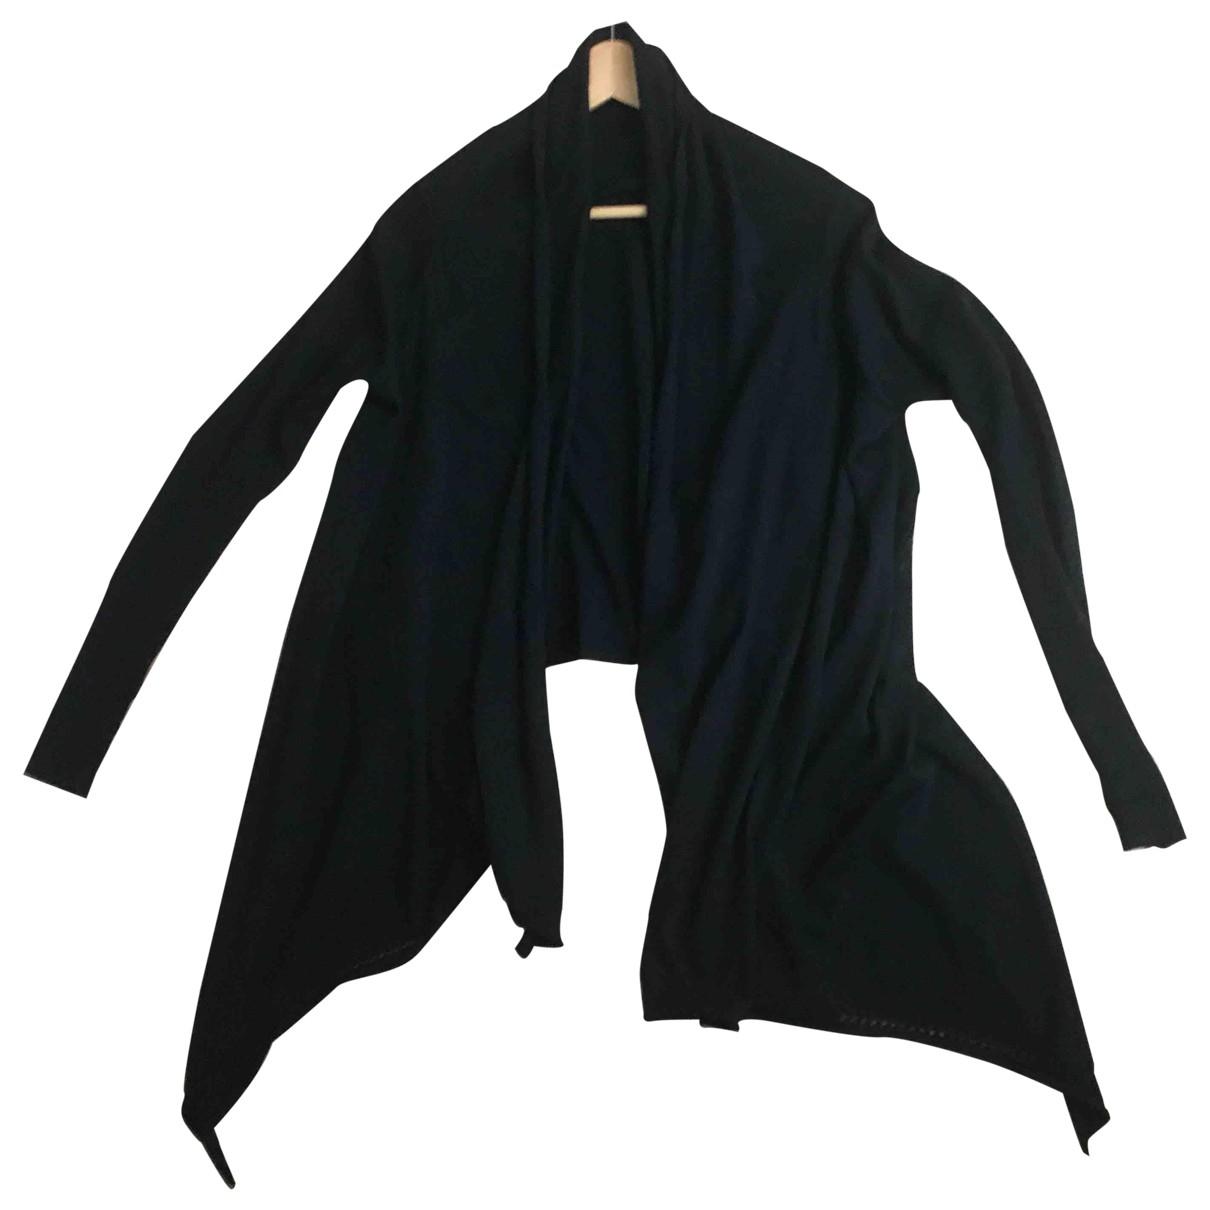 Zadig & Voltaire Spring Summer 2019 Black Wool Knitwear for Women One Size International